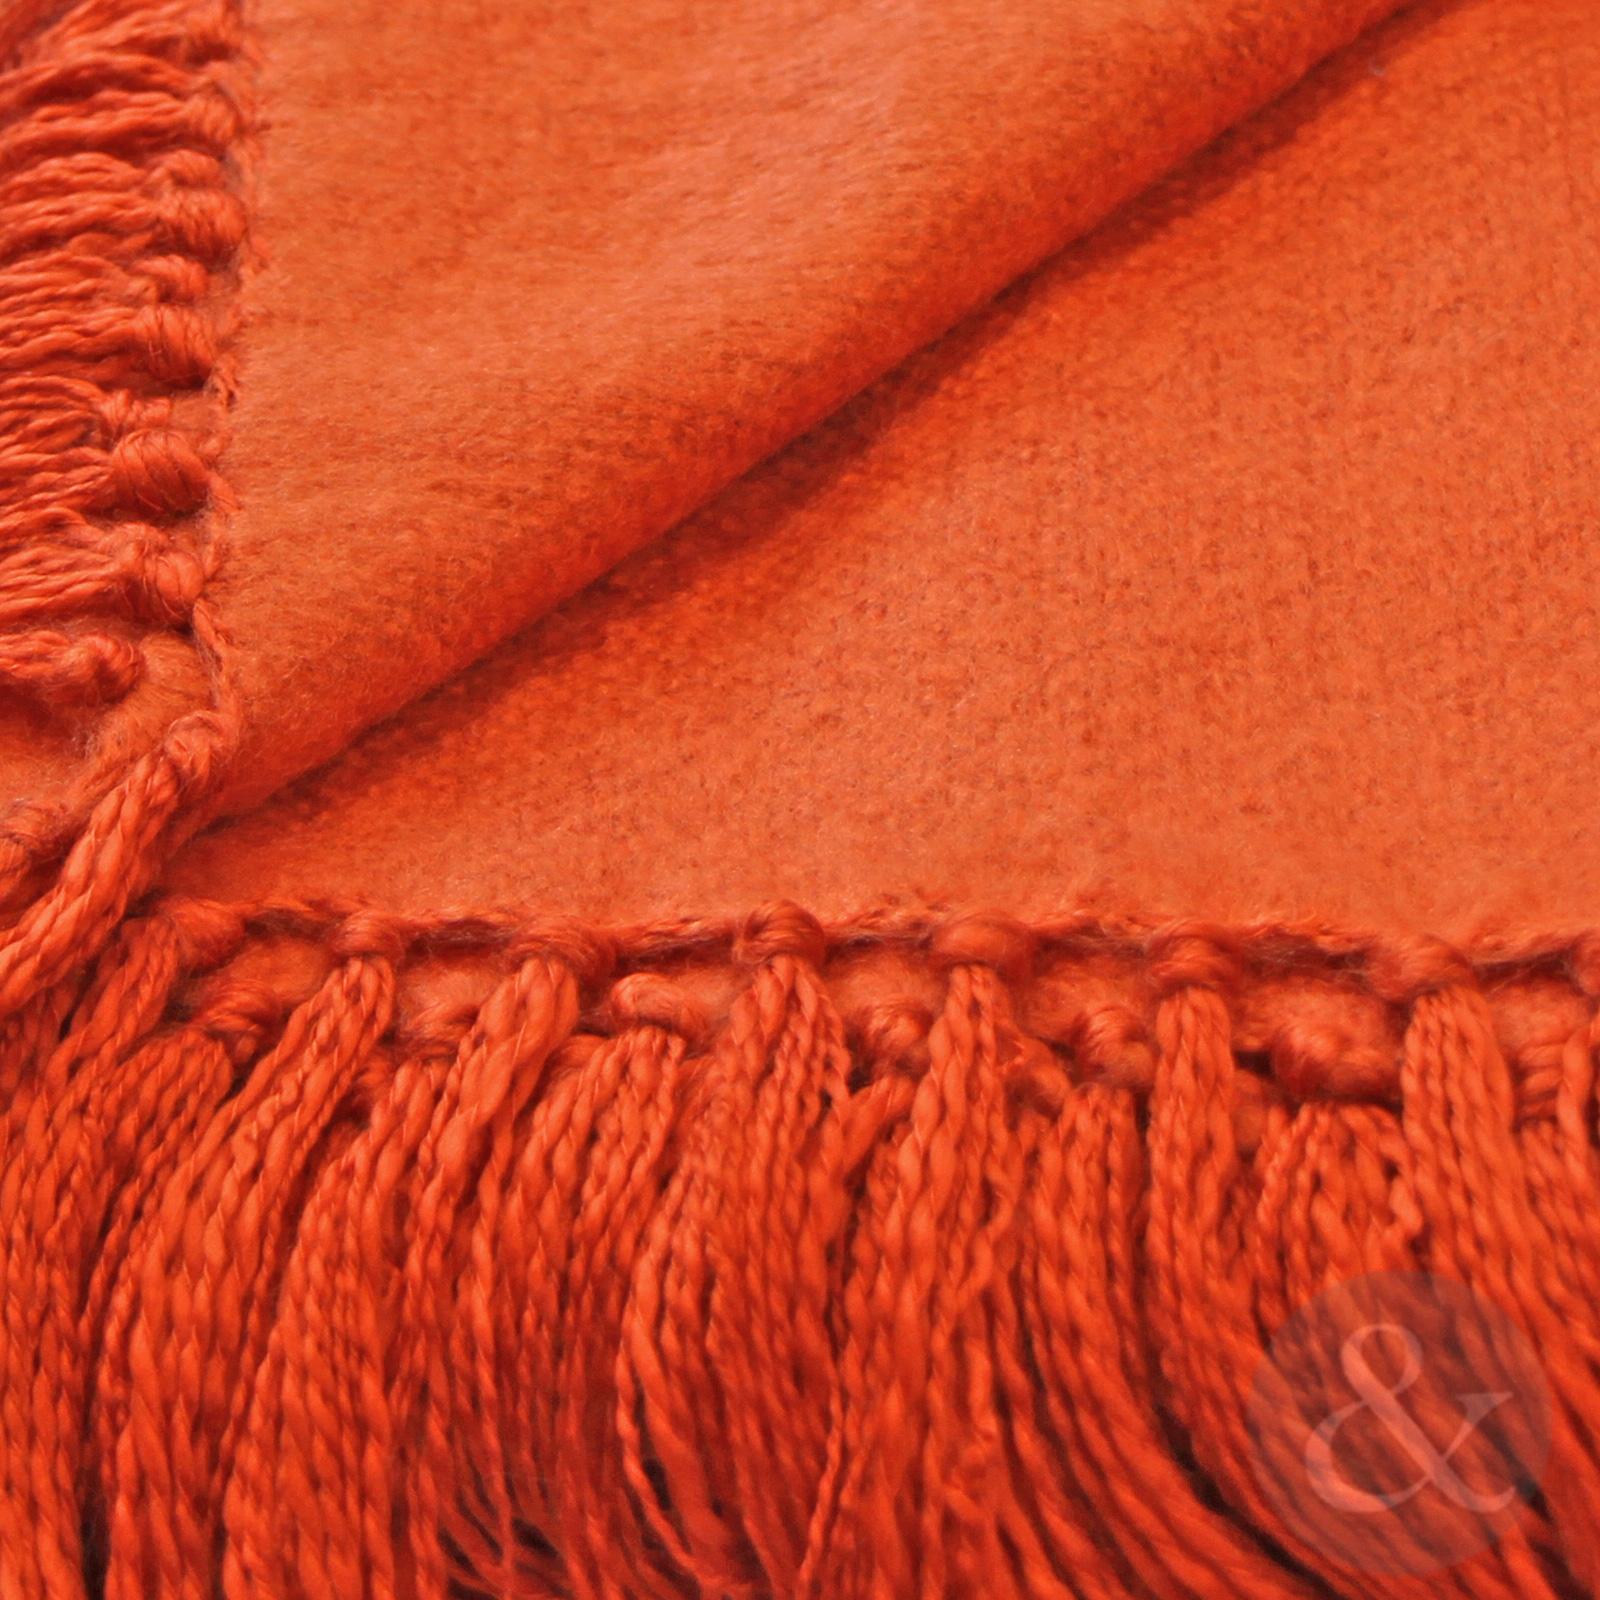 Plain Woven Fringe Throw Soft Acrylic Bed Blanket Sofa  : chiltern throw burntorange closeup2 from www.ebay.co.uk size 1600 x 1600 jpeg 819kB